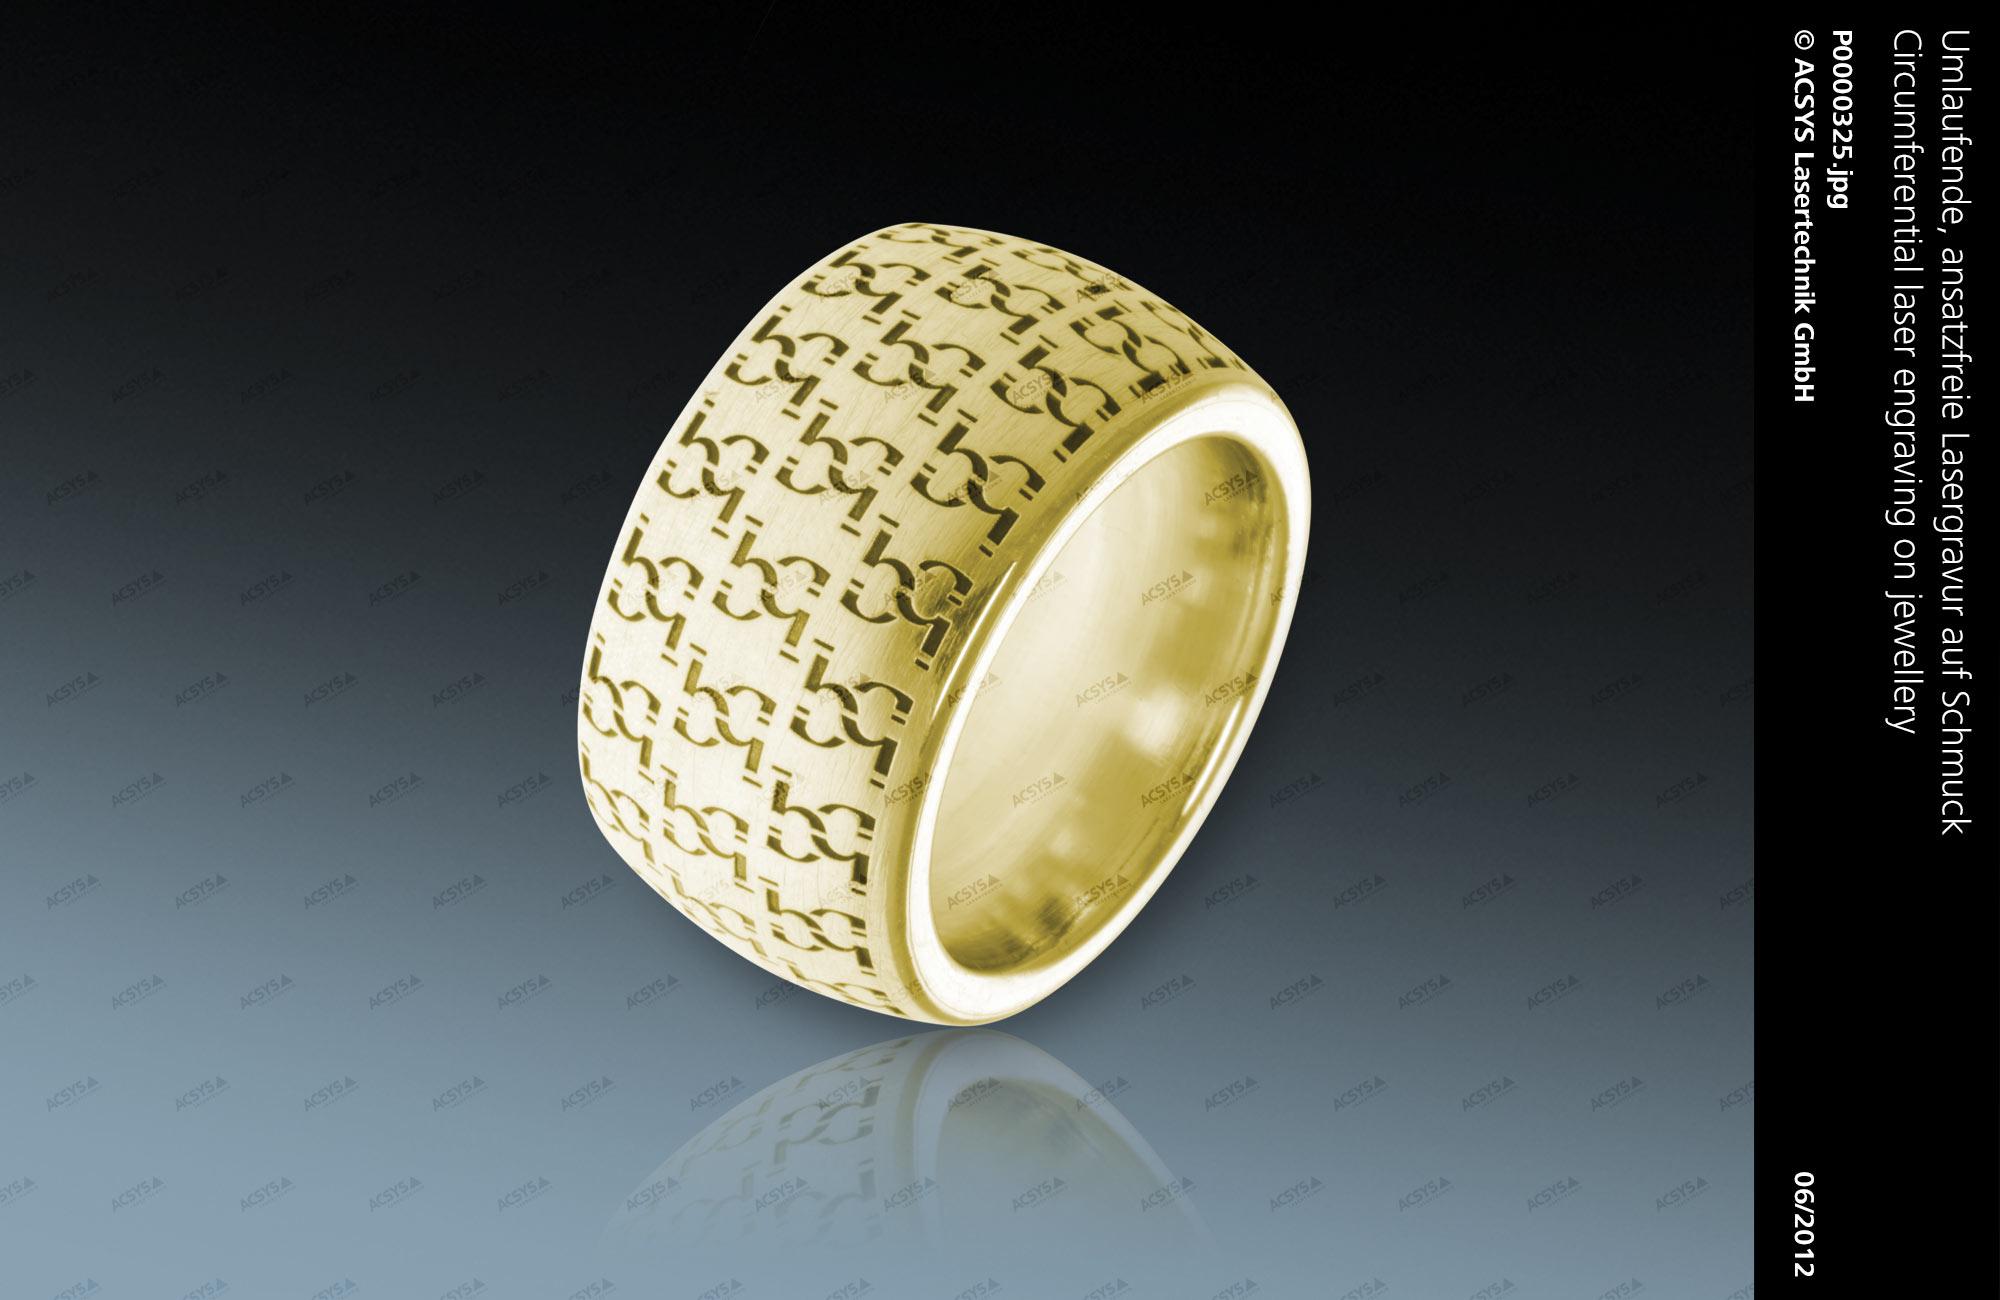 Watch And Jewelry Industry Acsys Lasermaschinen